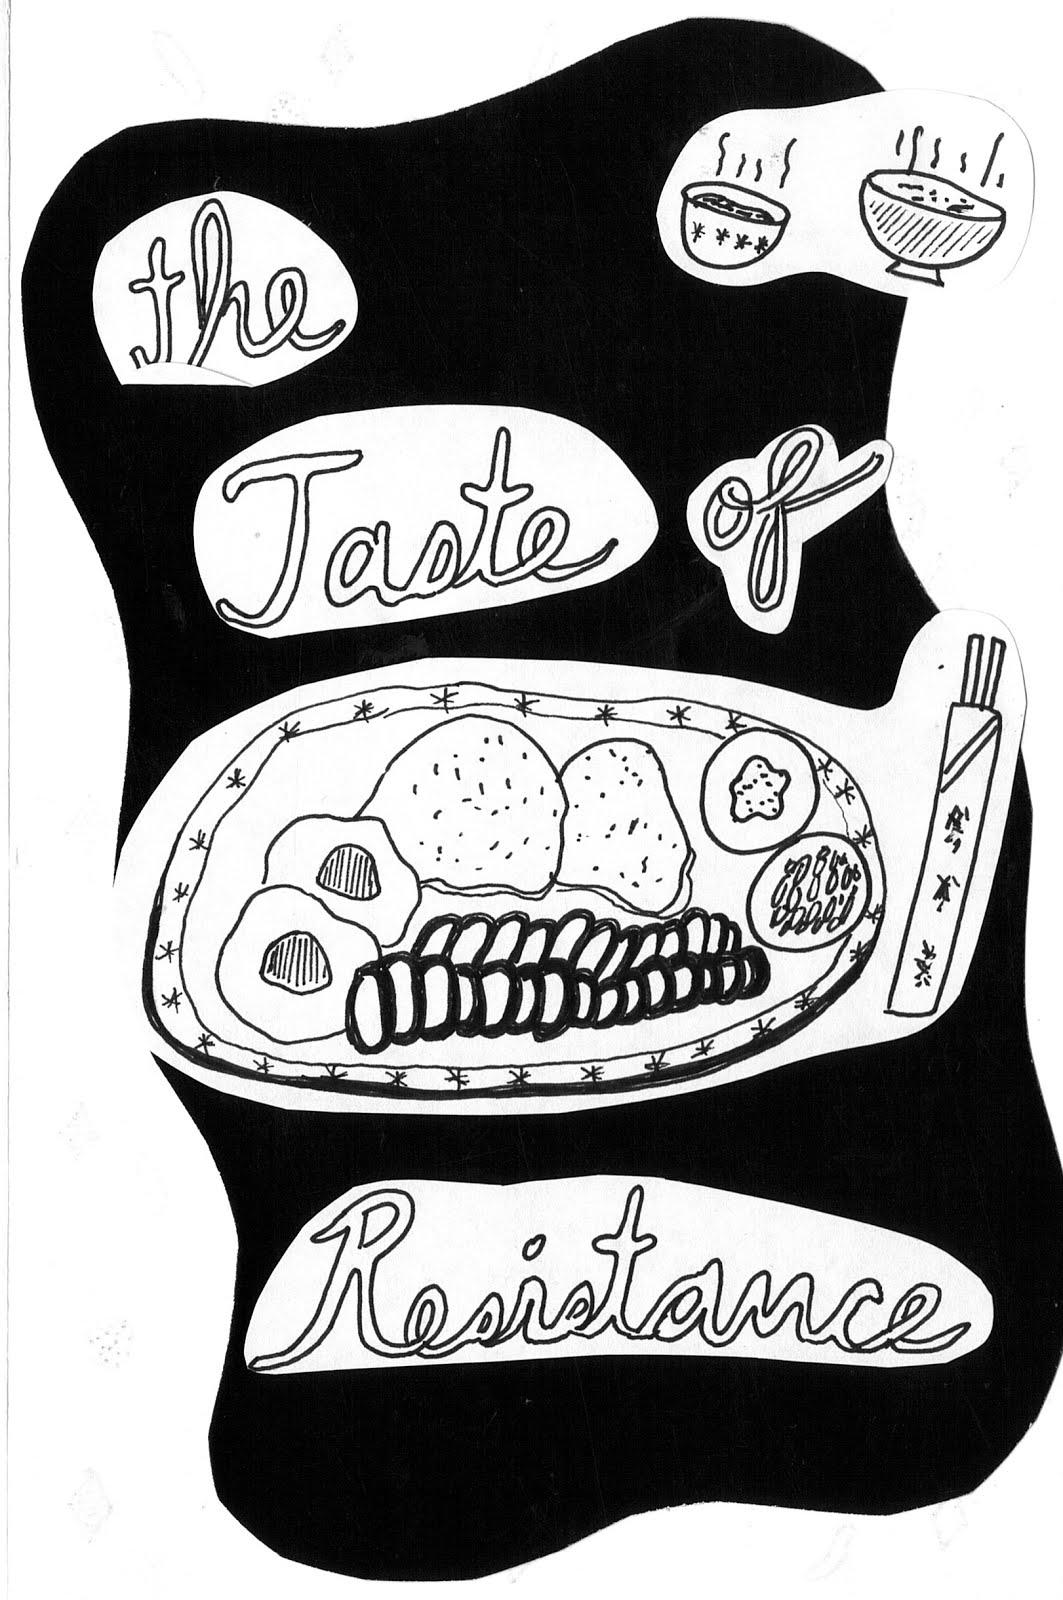 TASTE OF RESISTANCE